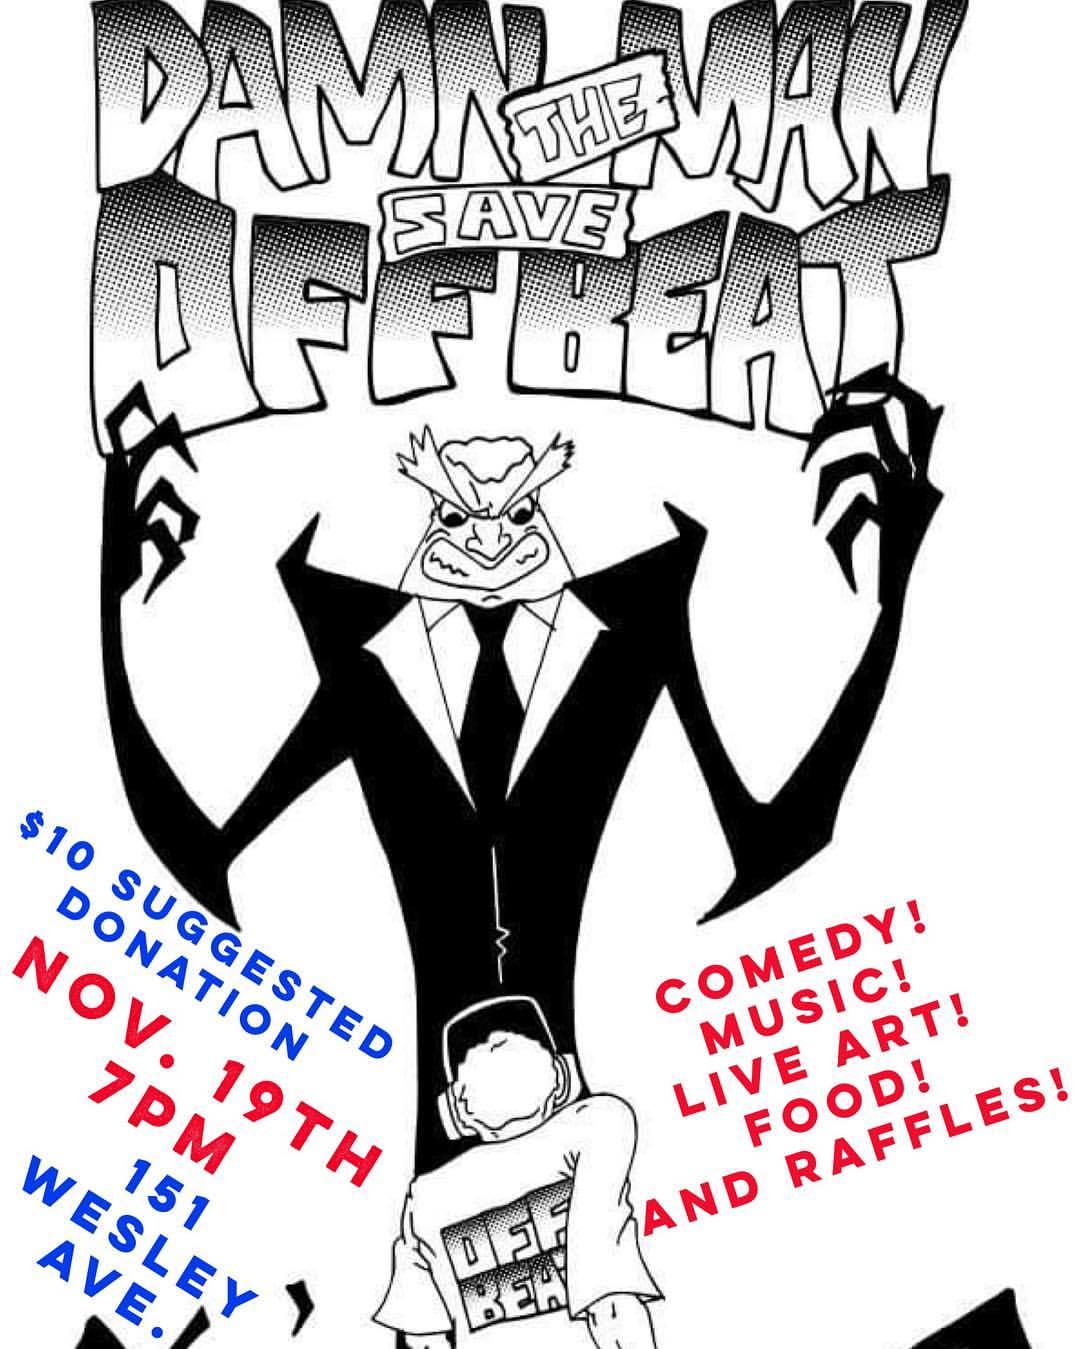 Damn the Man! Save the Offbeat! Benefit Event